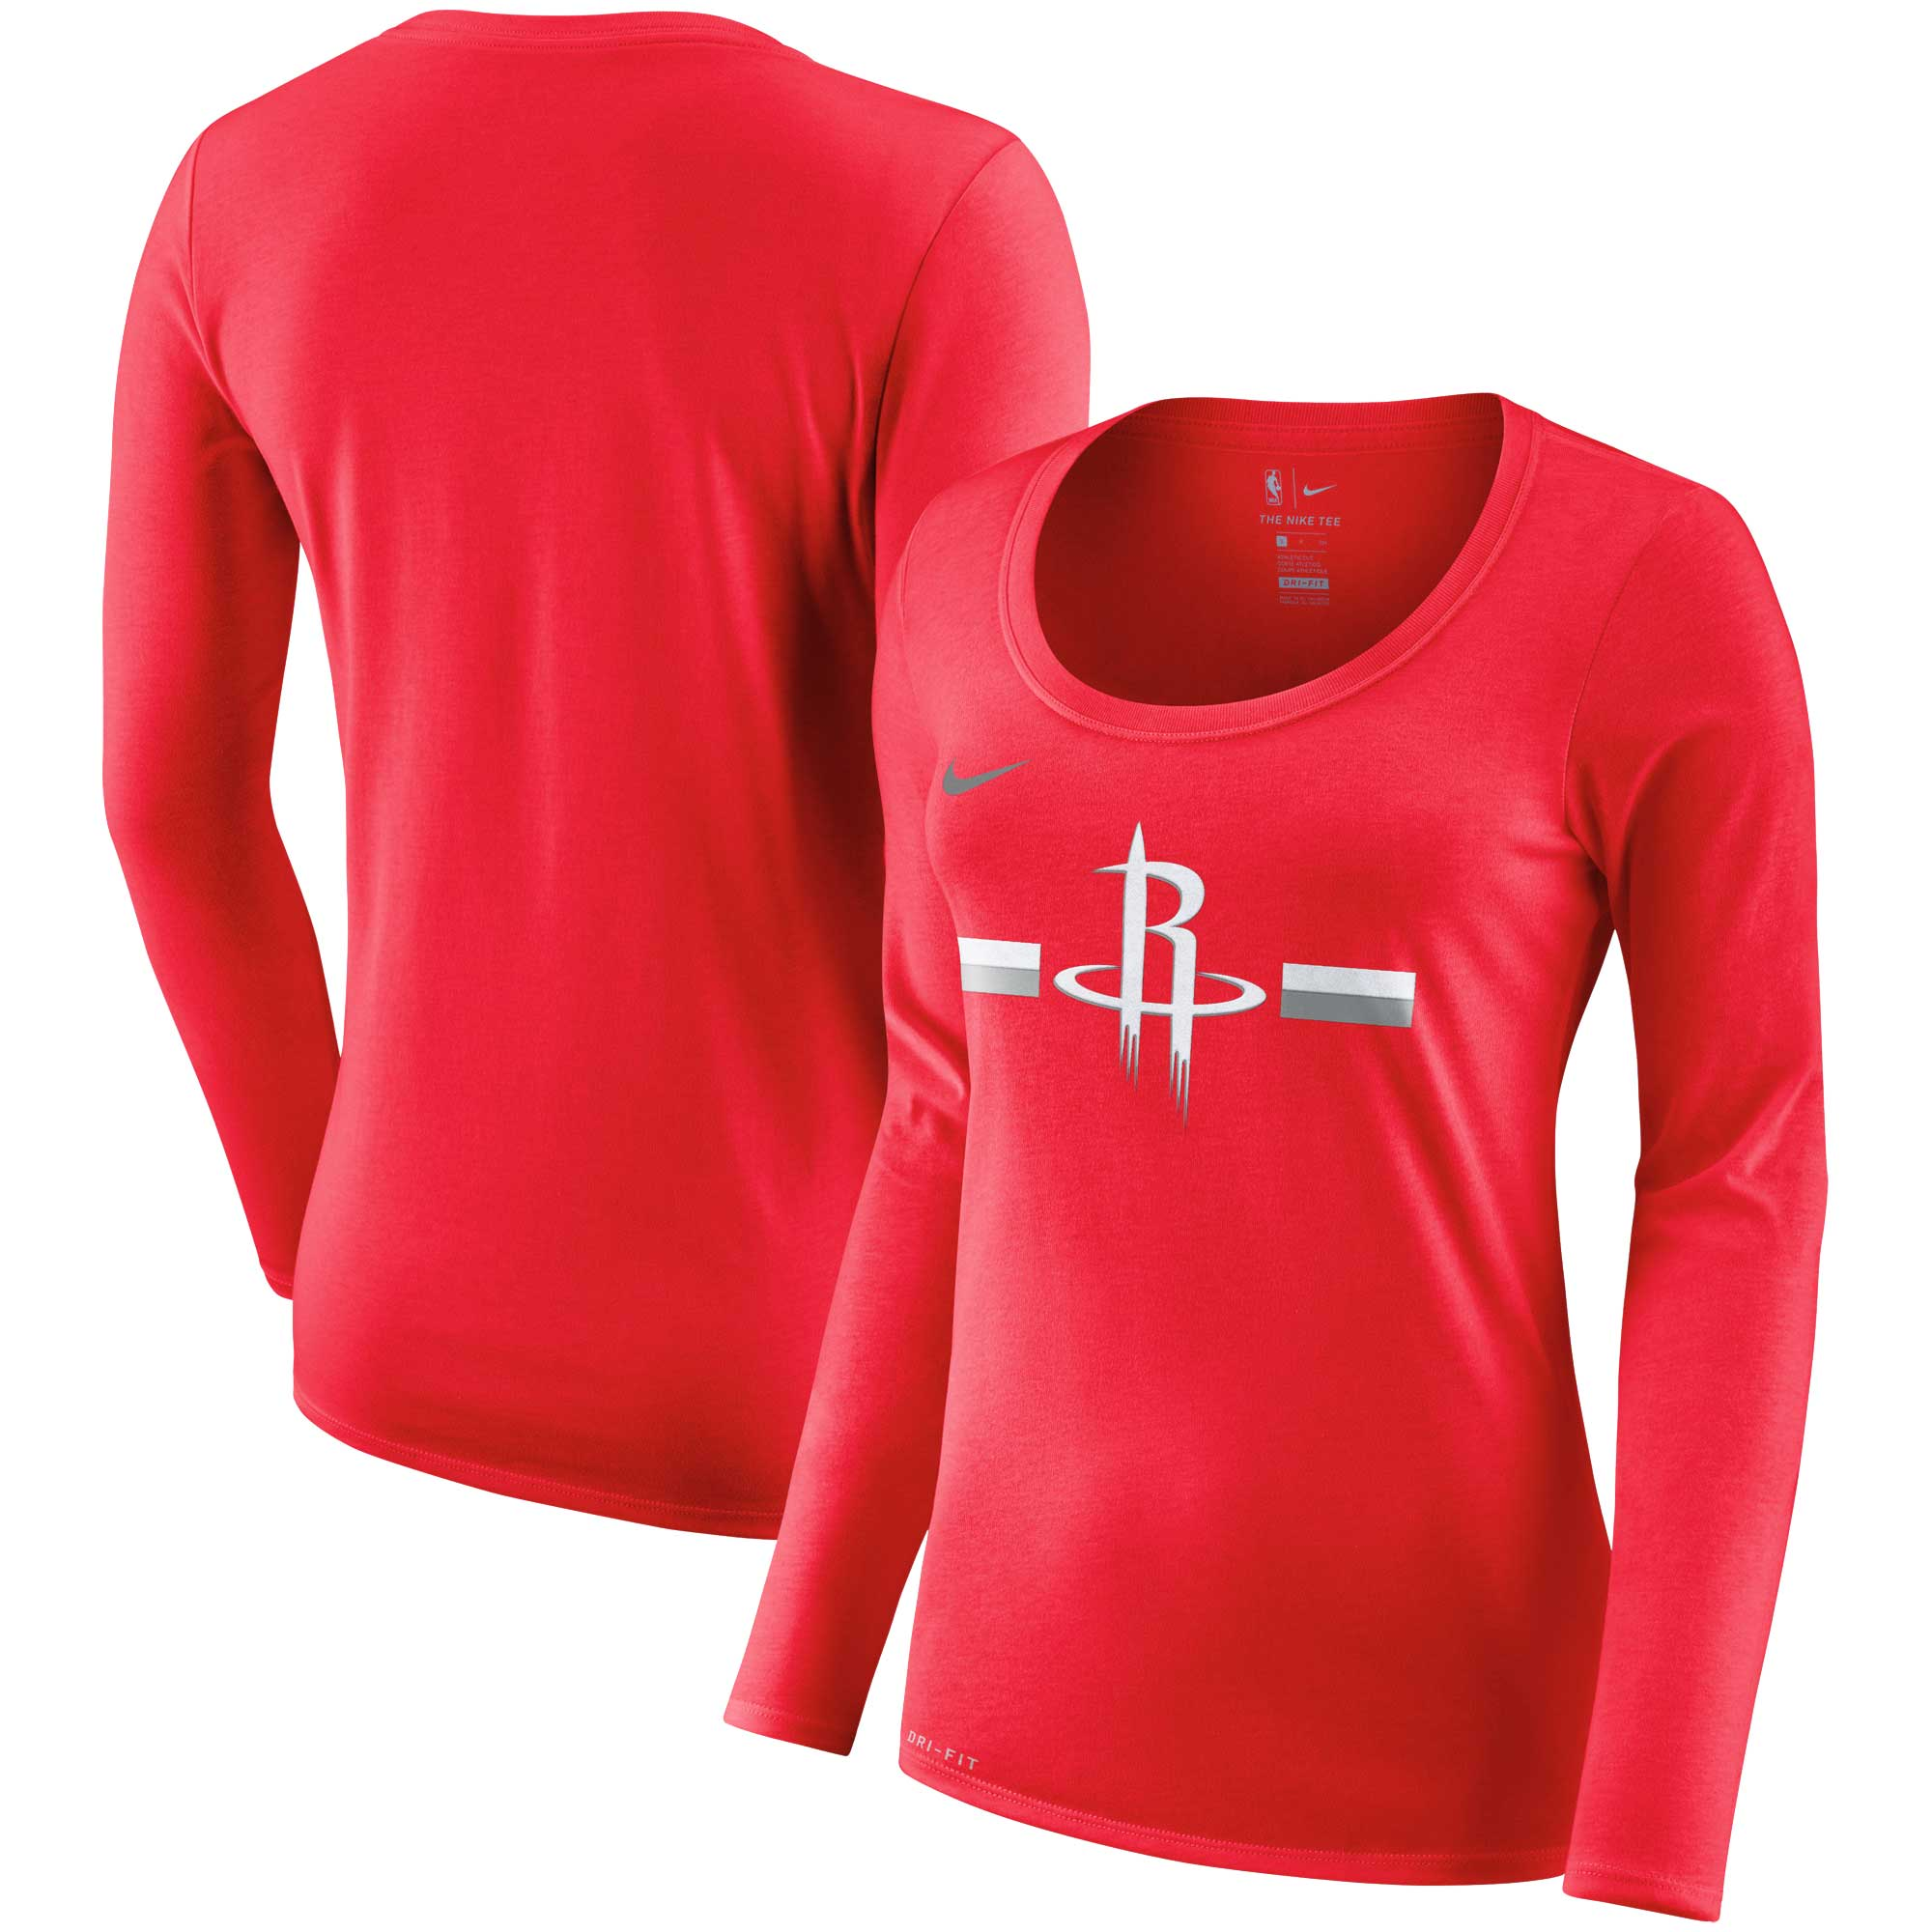 Houston Rockets Nike Women's Essential Logo Performance Long Sleeve T-Shirt - Red